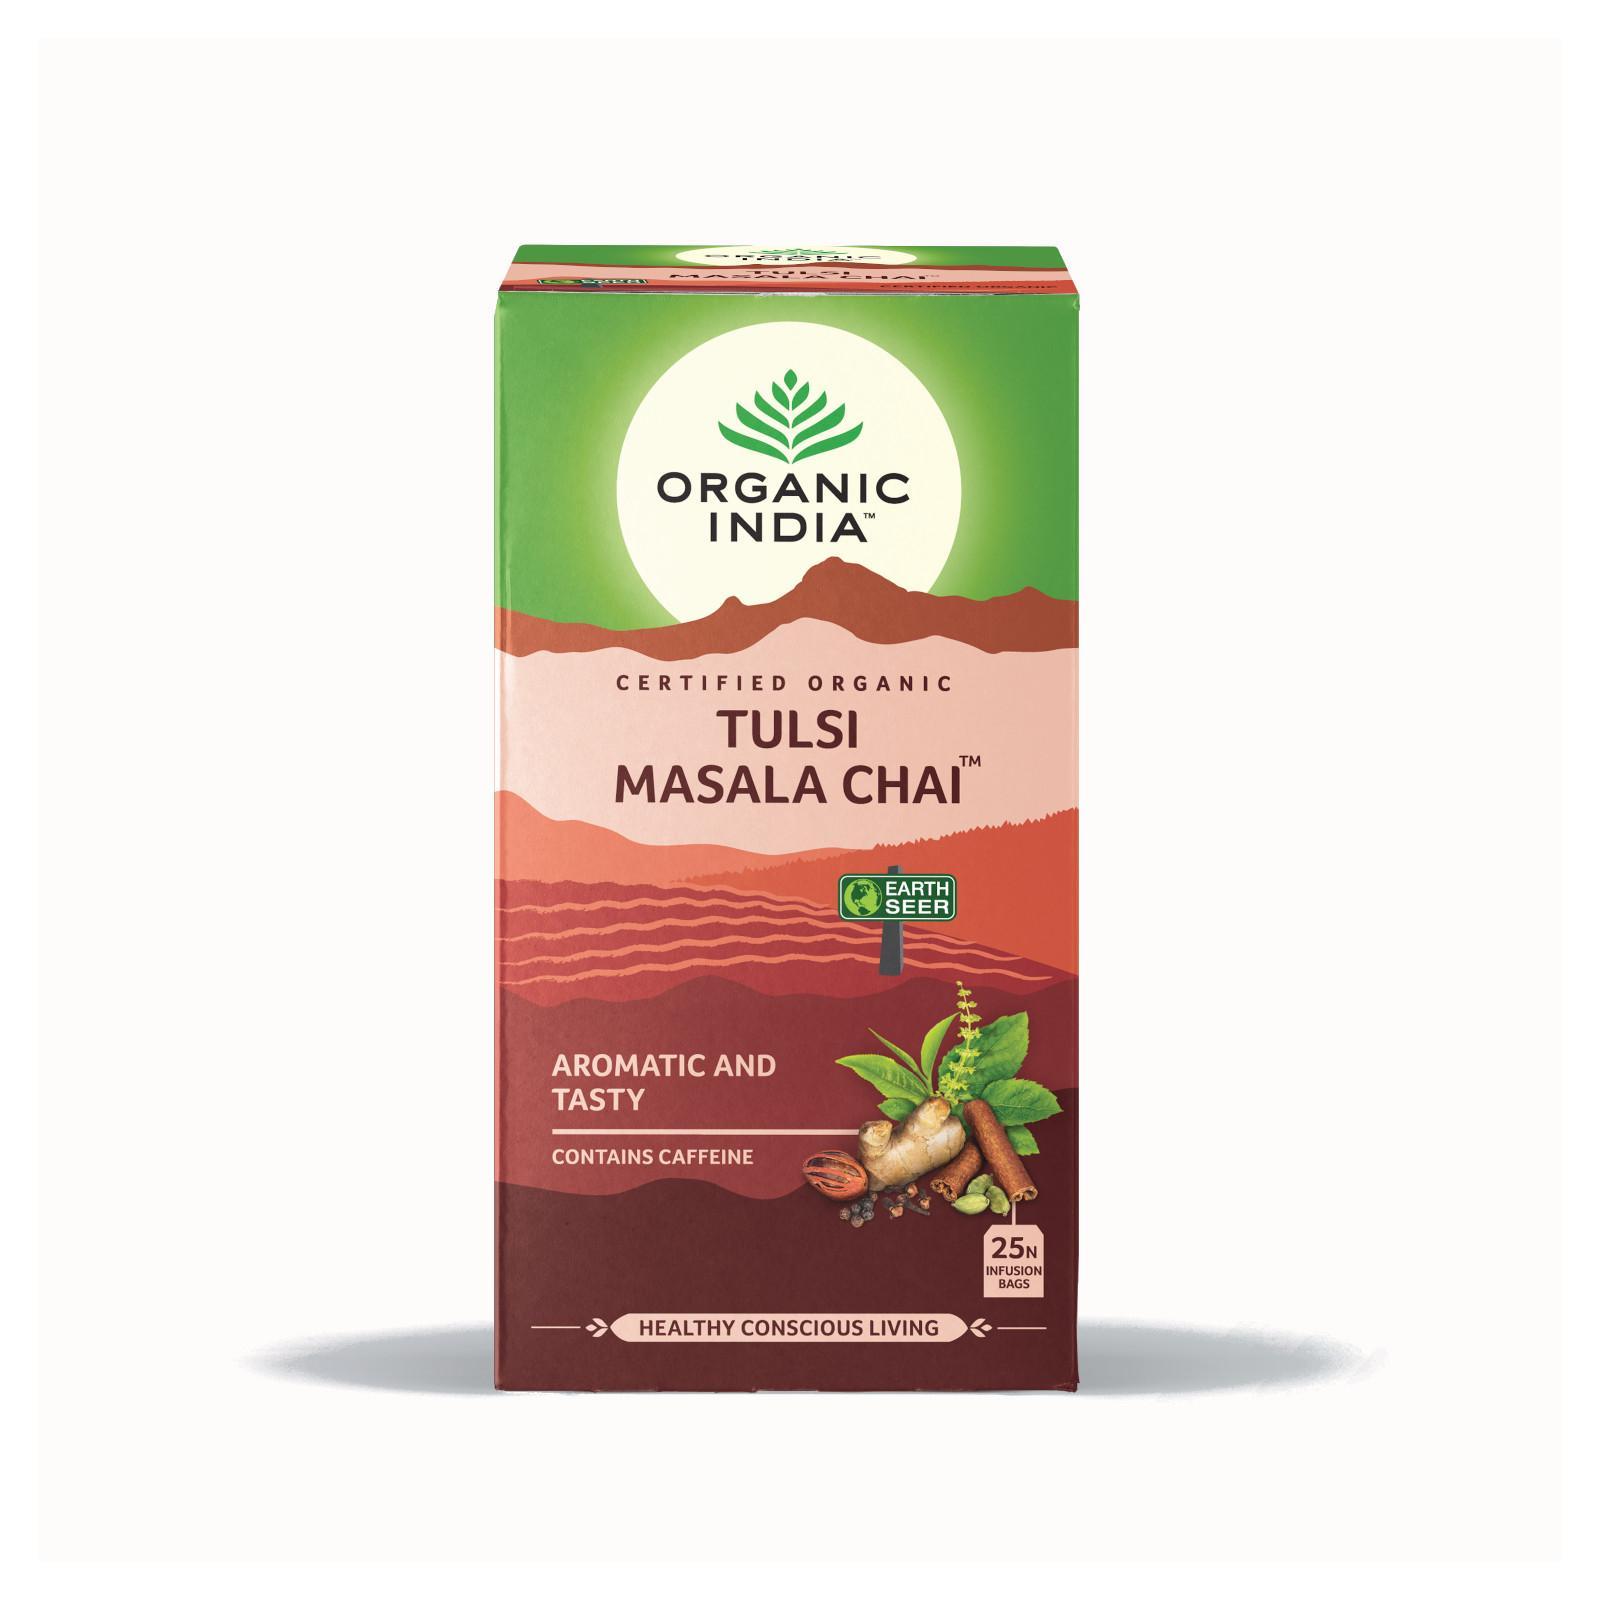 Organic India Čaj Tulsi Chai Masala, porcovaný, bio 43,5 g, 25 ks